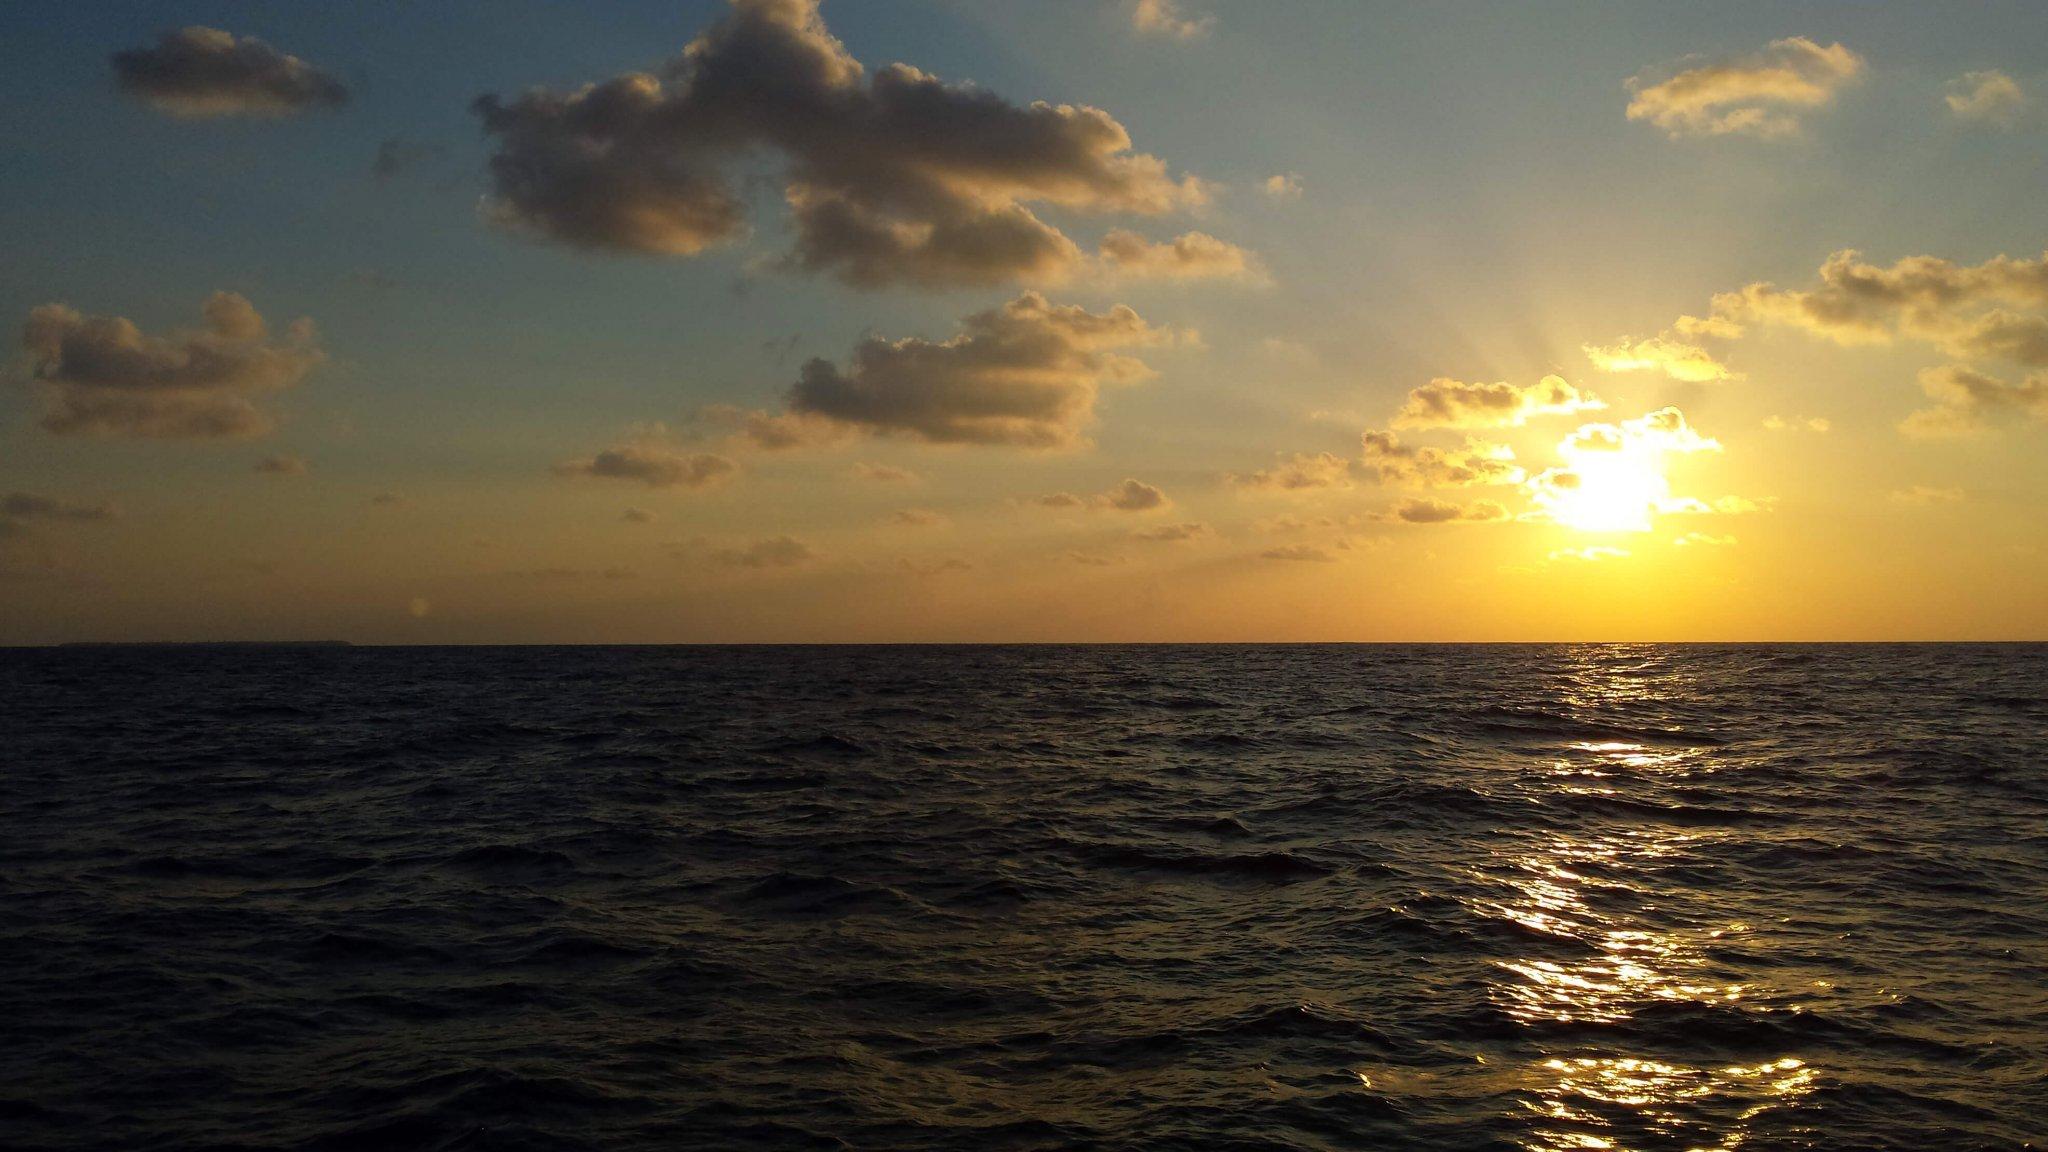 zonsondergang-op-zee